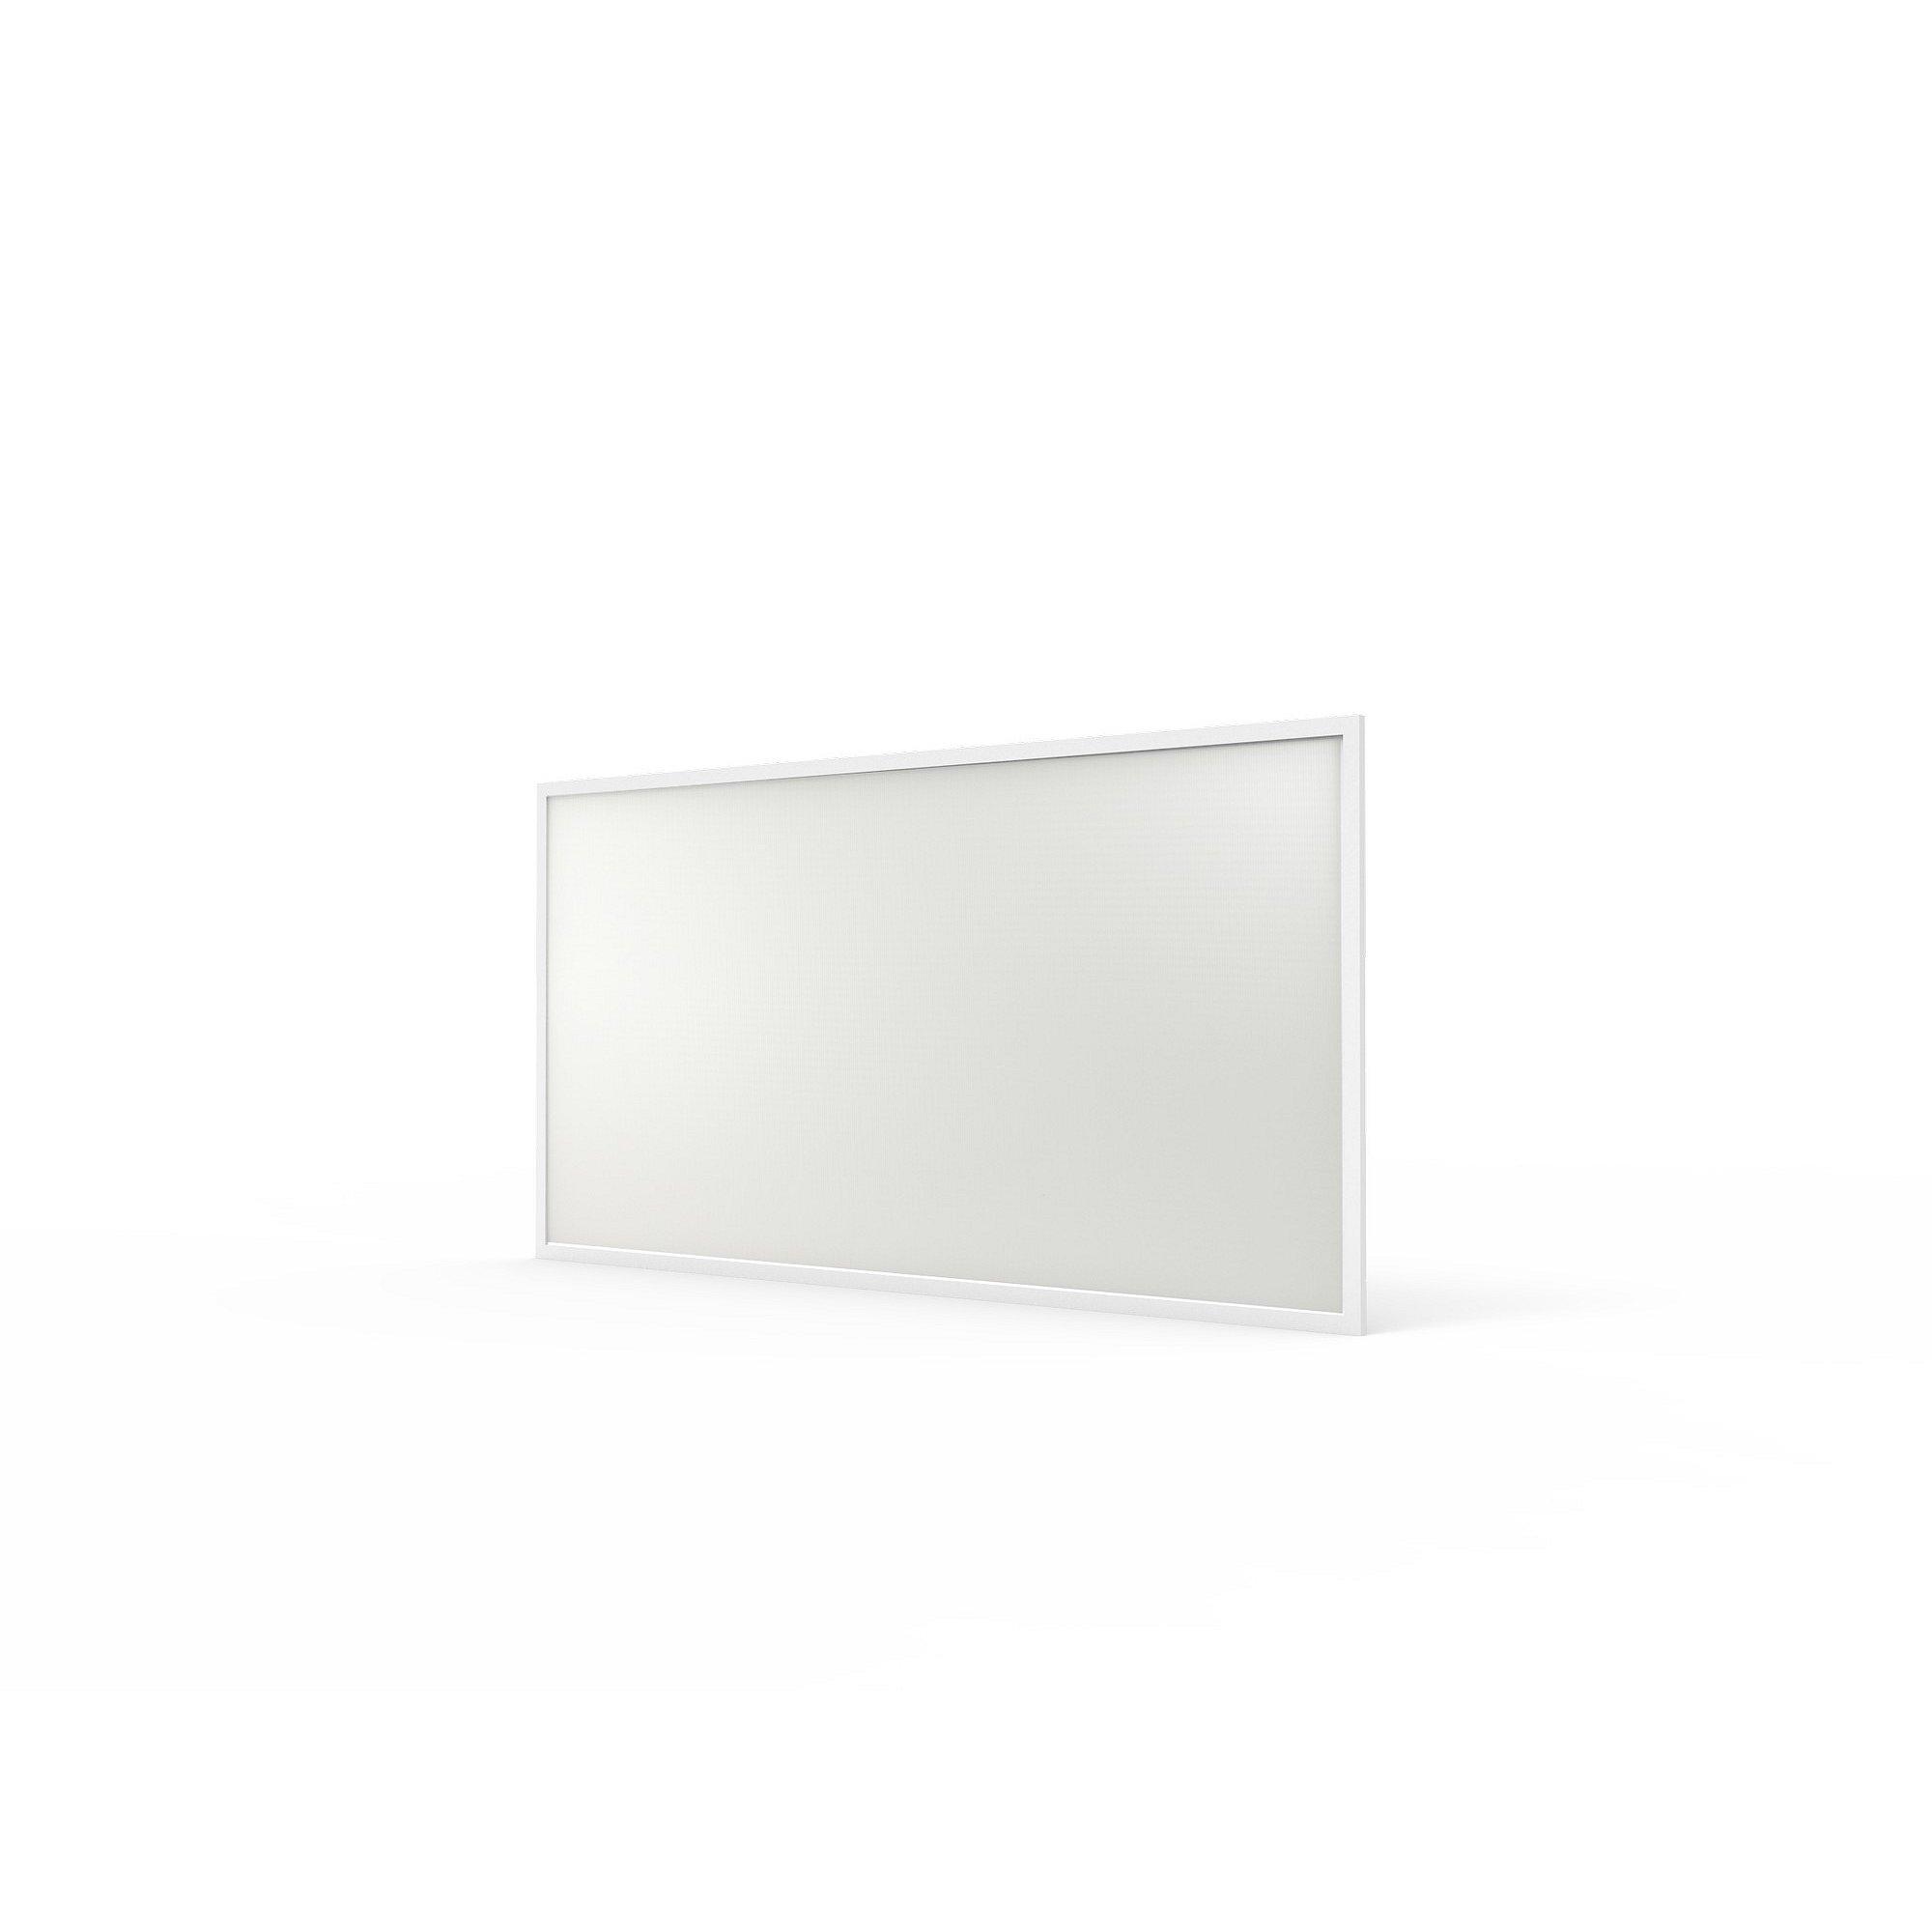 Panel LED Thome Lighting, 60 W, 6000 lm, IP 44